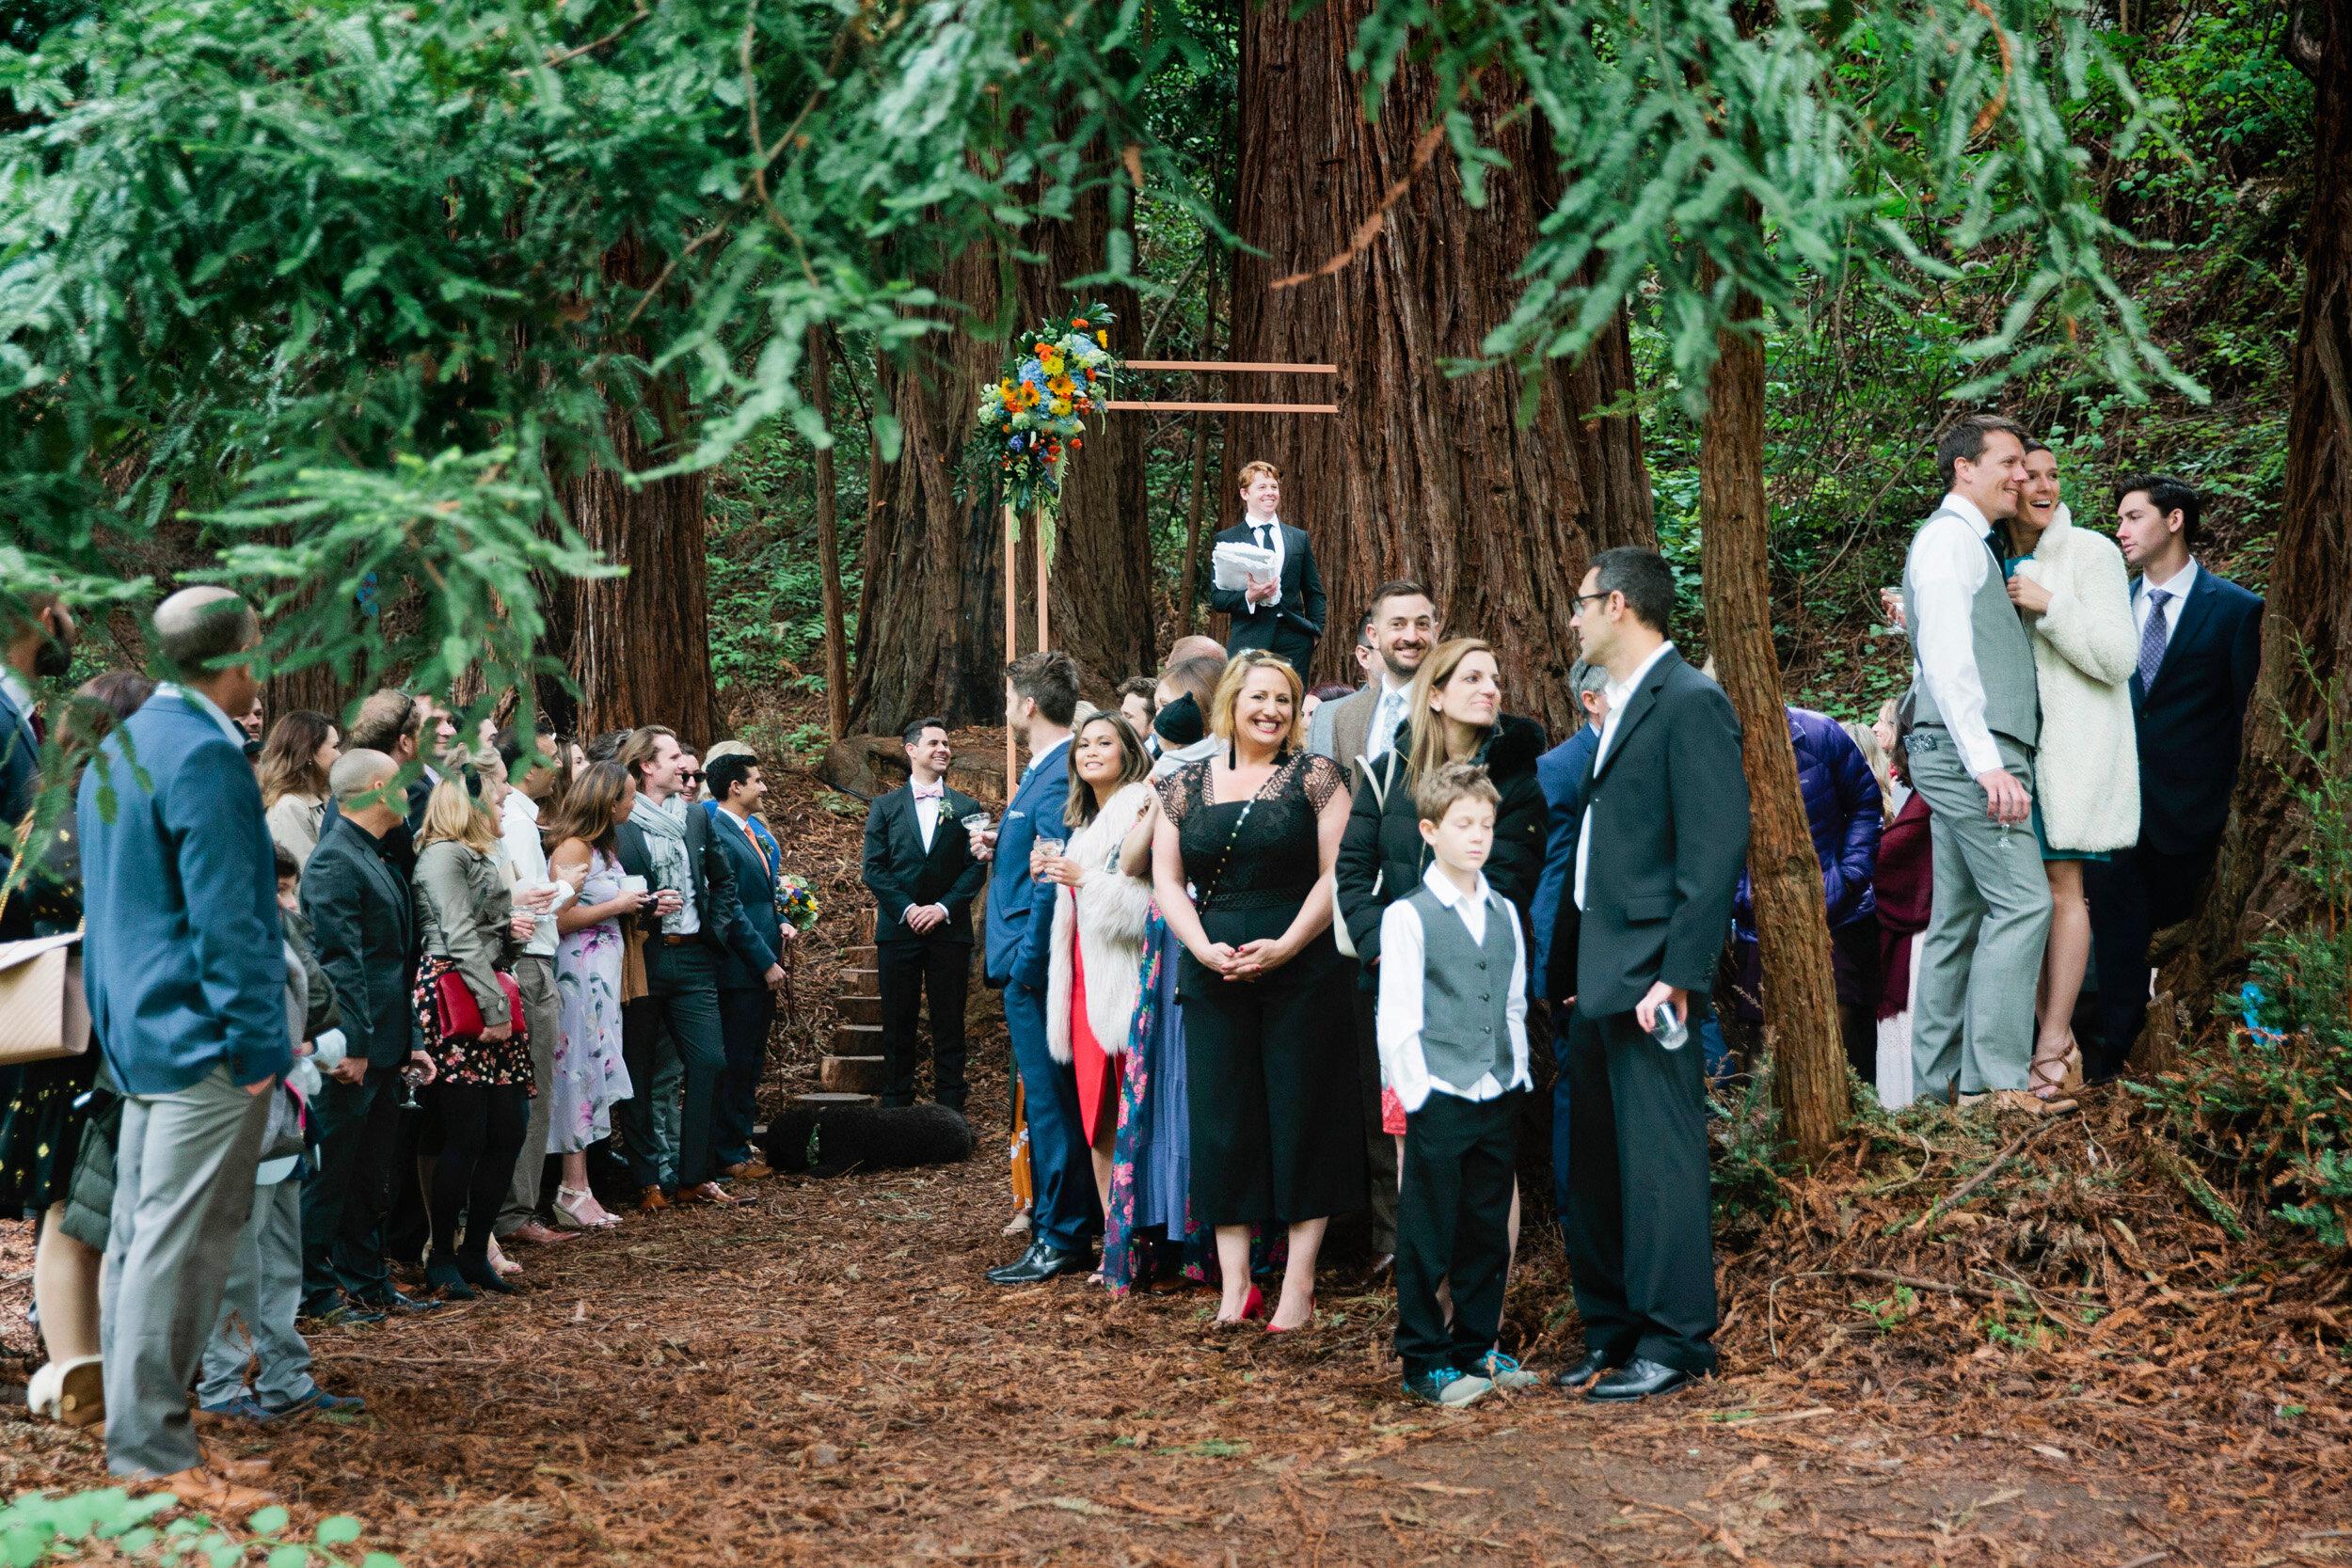 OVY-Camp-Wedding-34.JPG